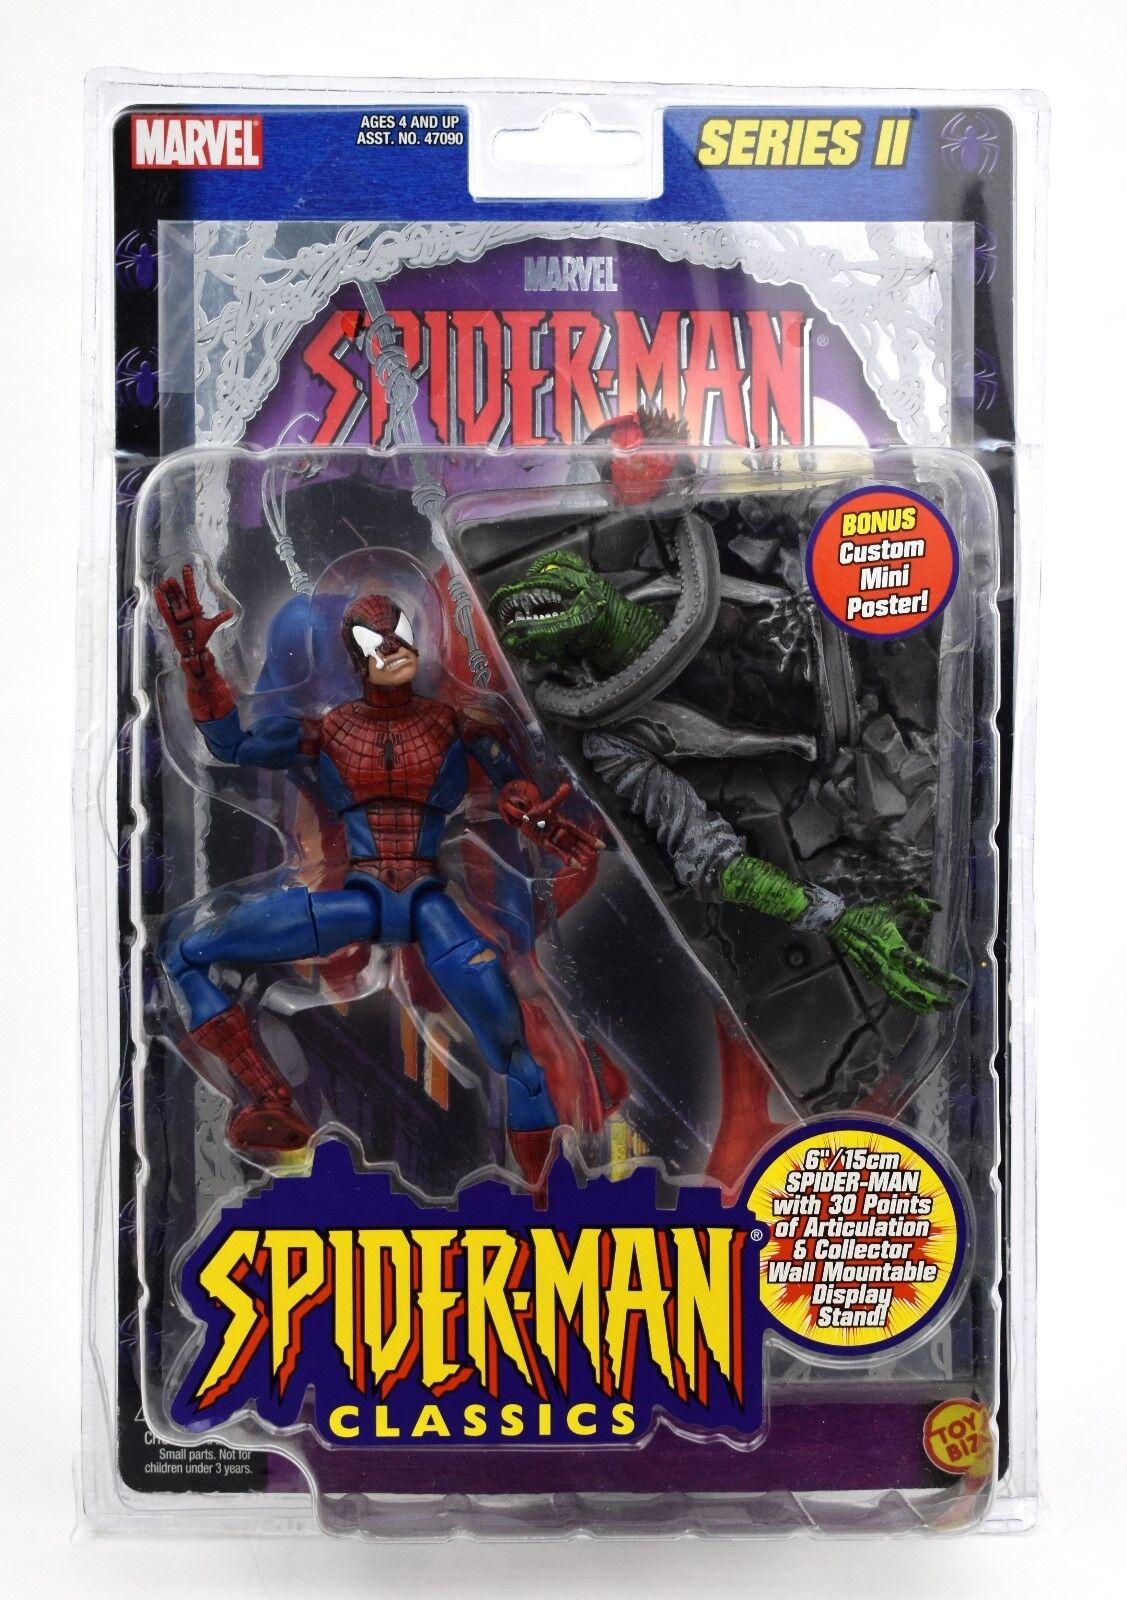 Spider-Man Classics Series II (Foil) - Battle Ravaged Spider-Man Action Figure